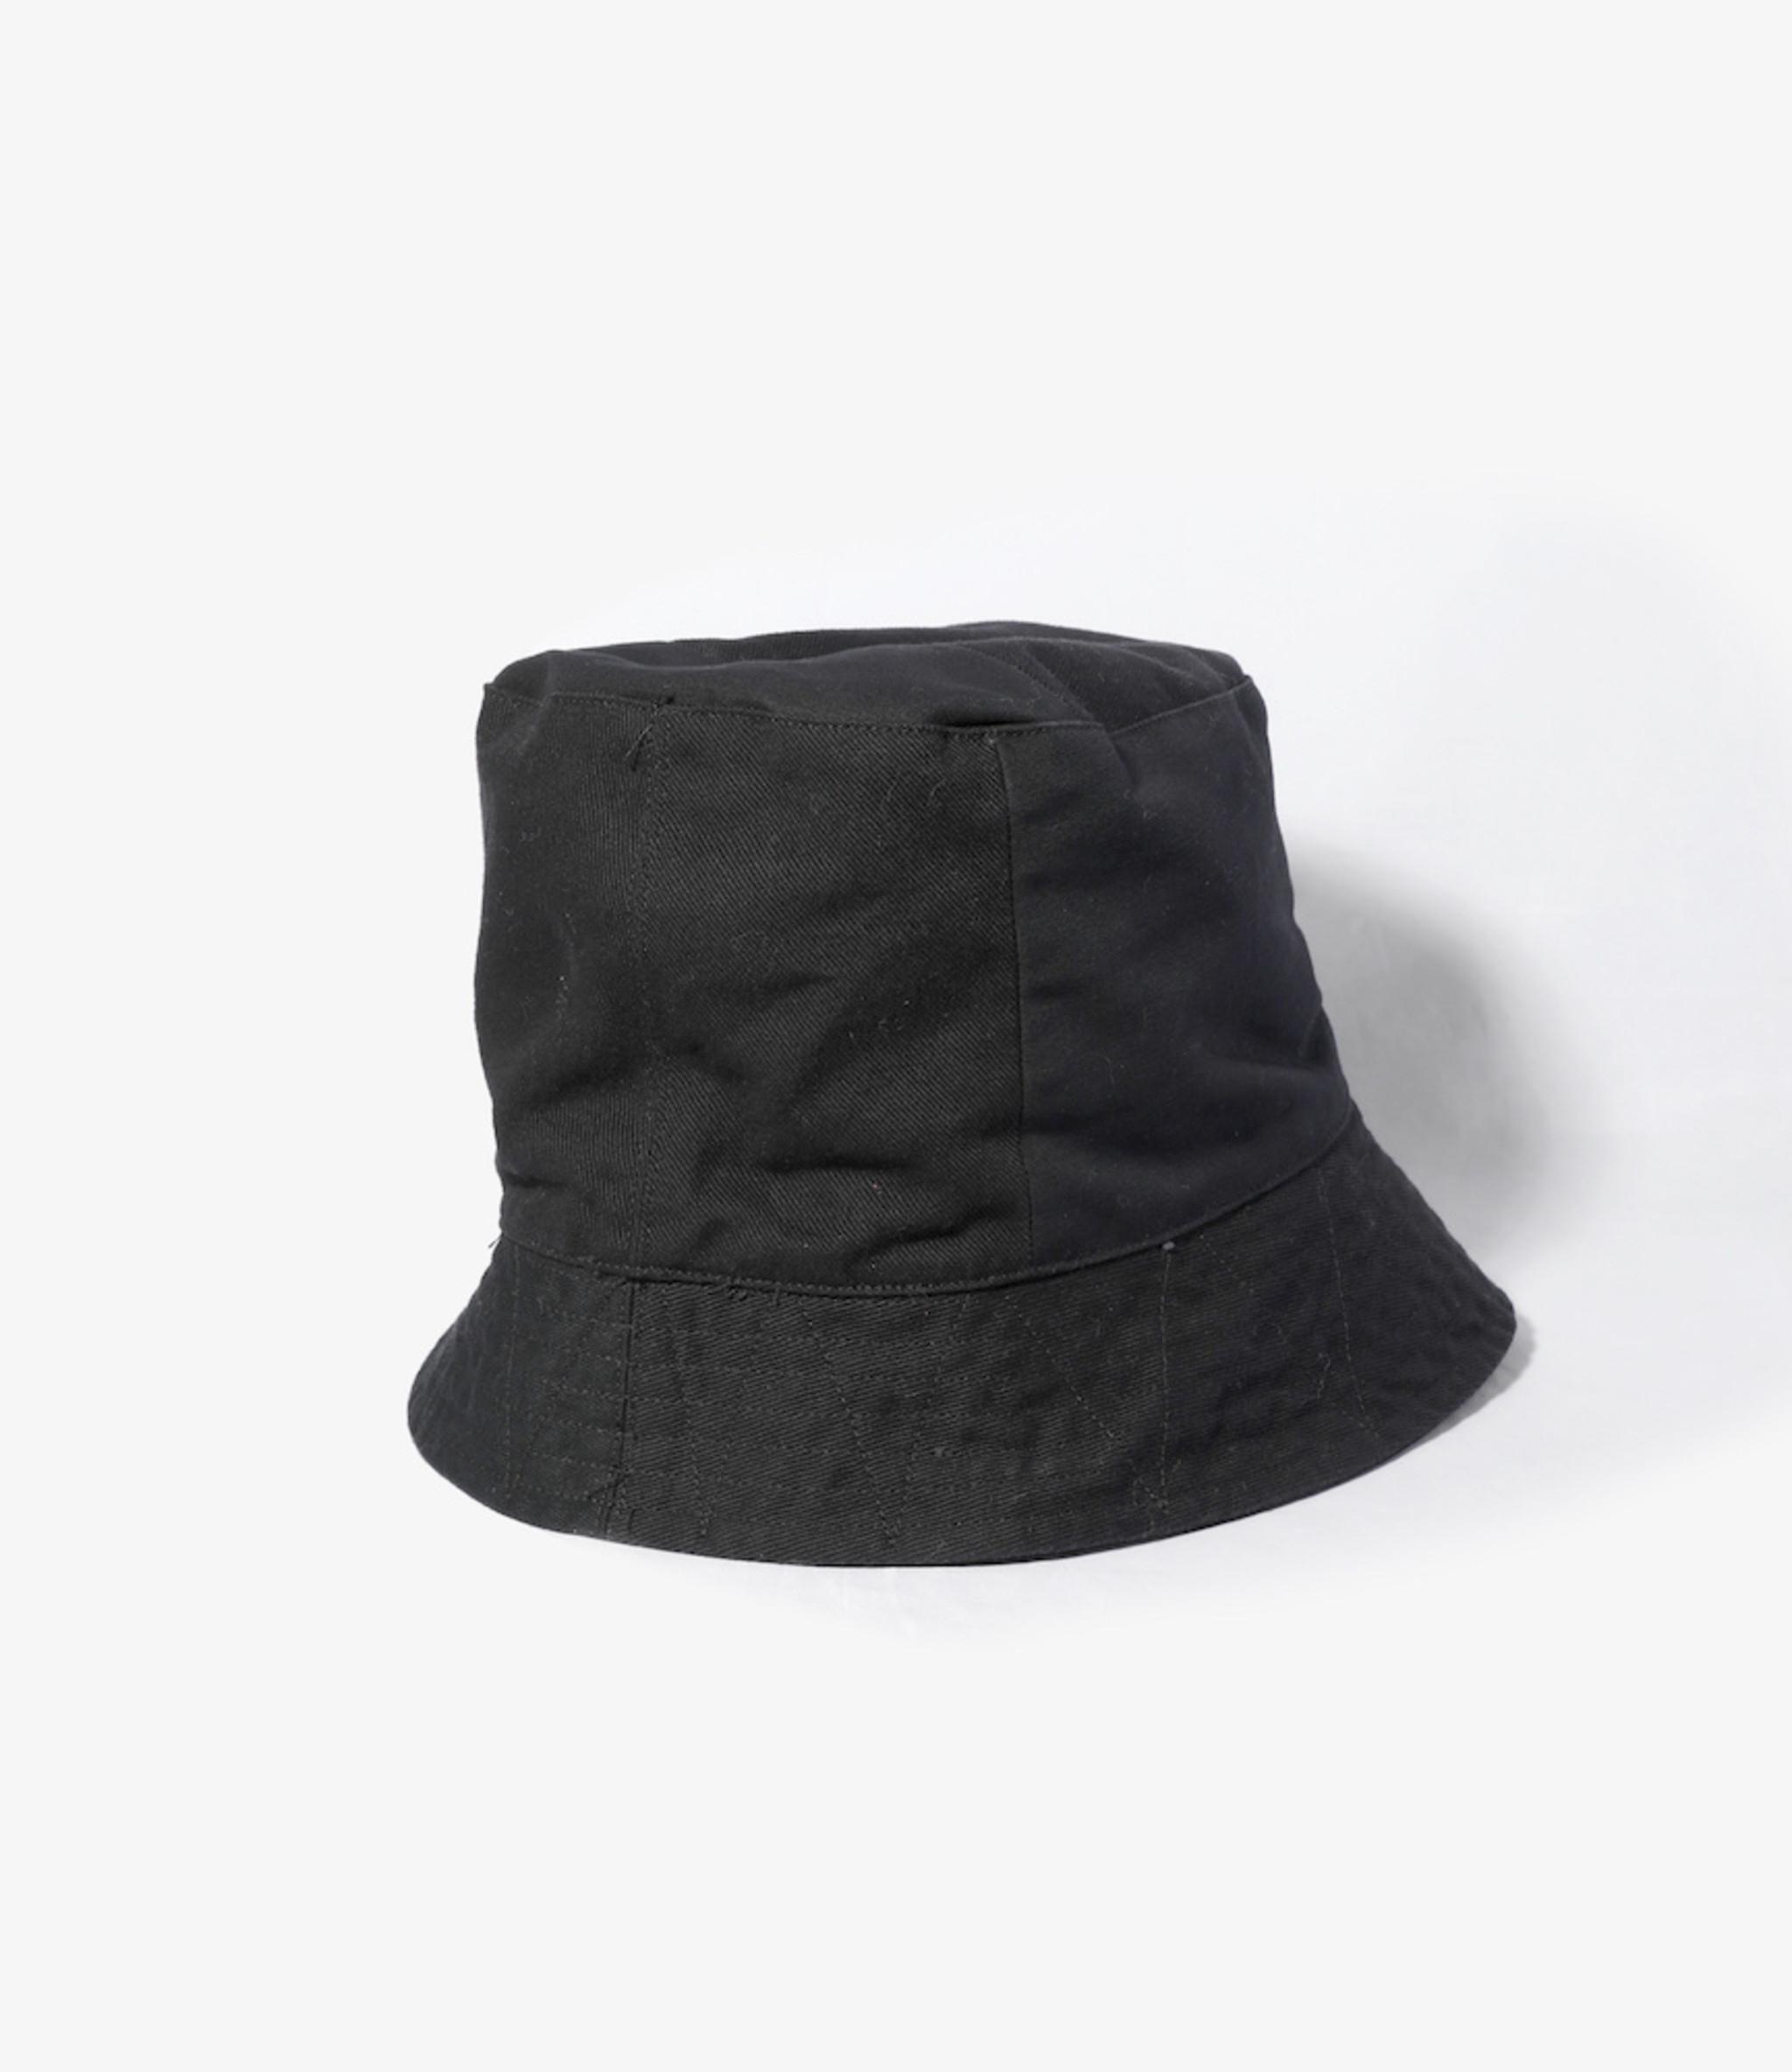 Engineered Garments Bucket Hat - Black Cotton Heavy Twill